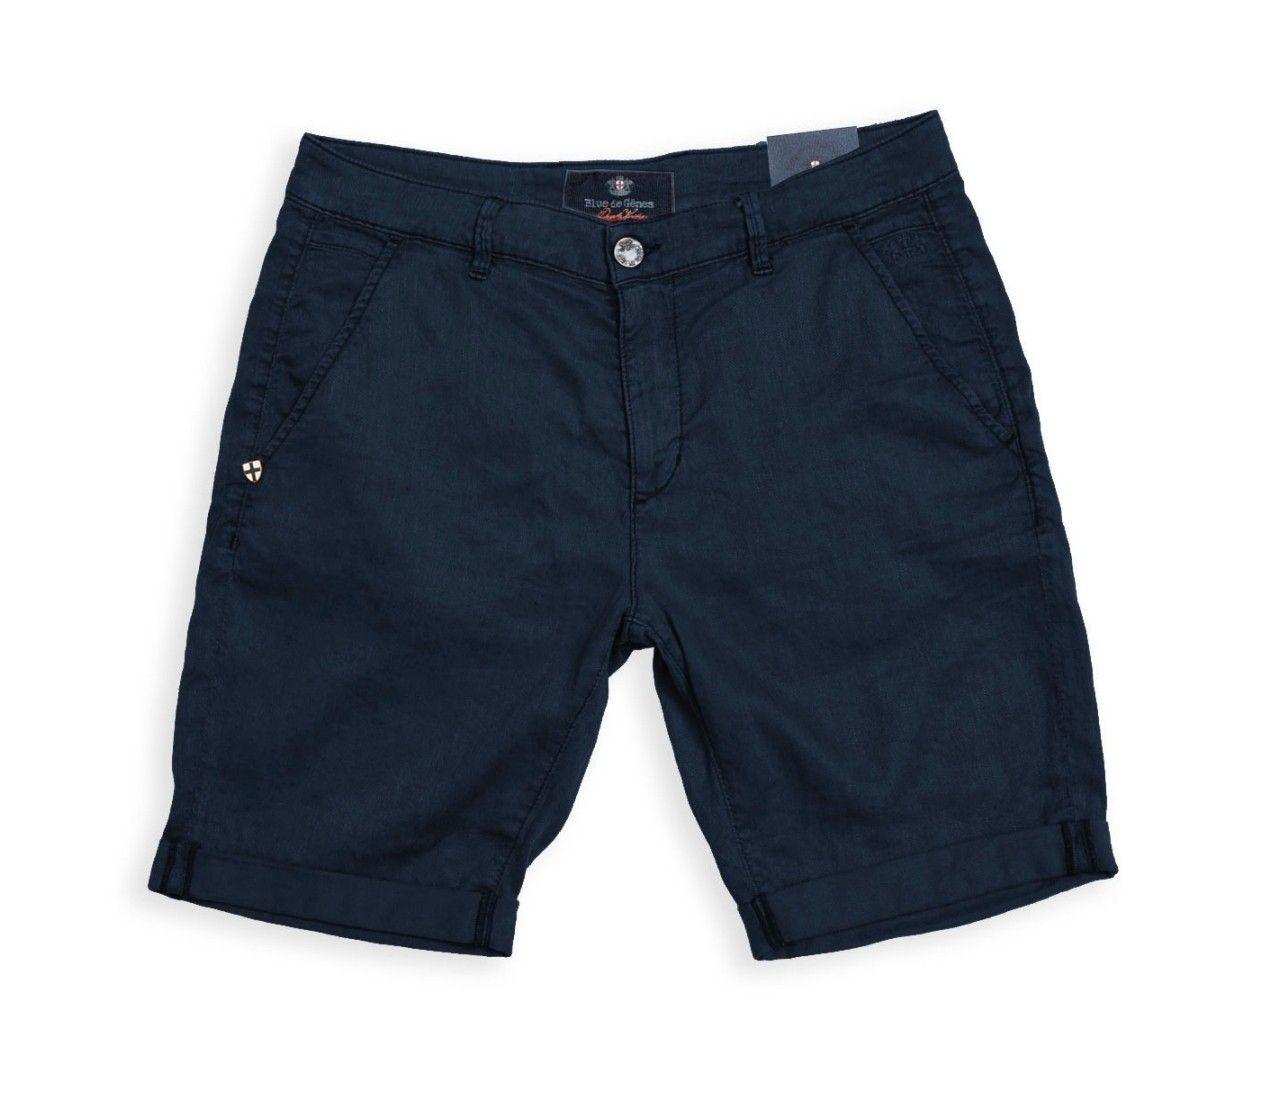 BLUE DE GÊNES - Herren Shorts - Teo Shane Shorts - Navy